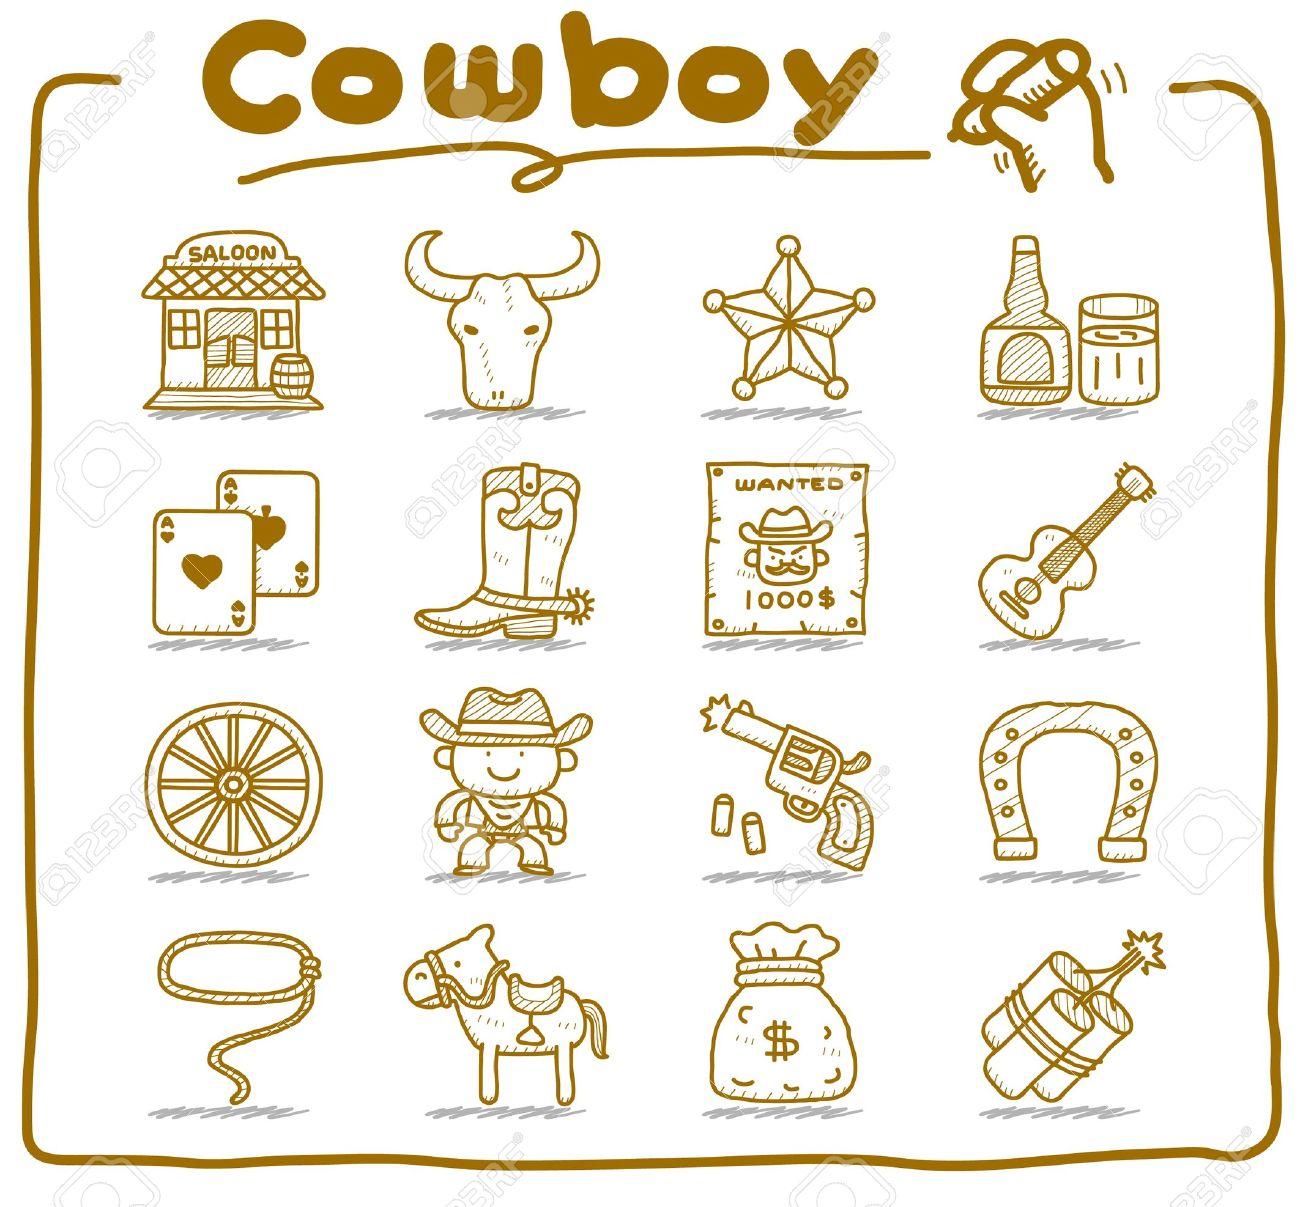 hand drawn wild west,cowboy icon set.doodle vector format. Stock Vector - 11270373